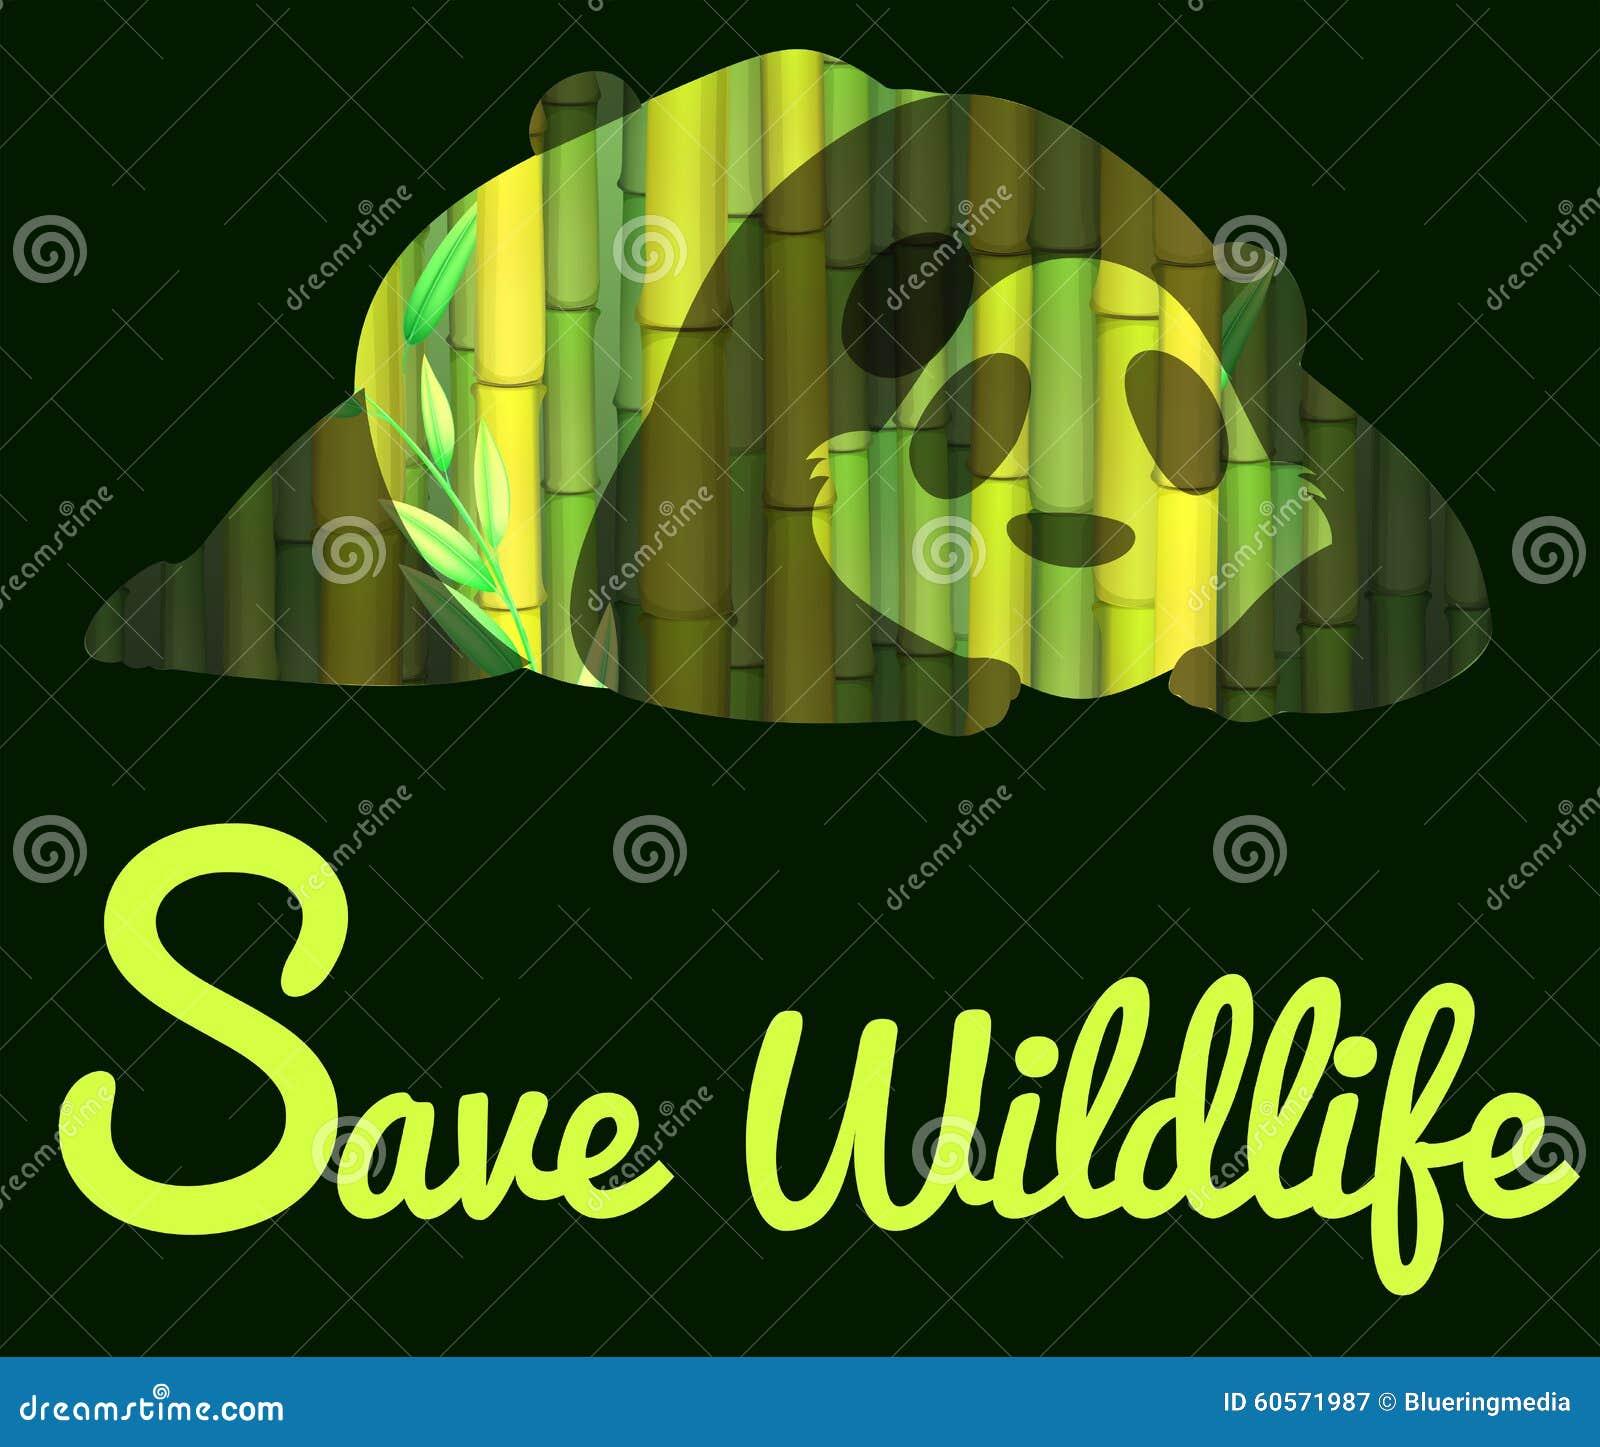 Save Wildlife With Panda Stock Illustration - Image: 60571987